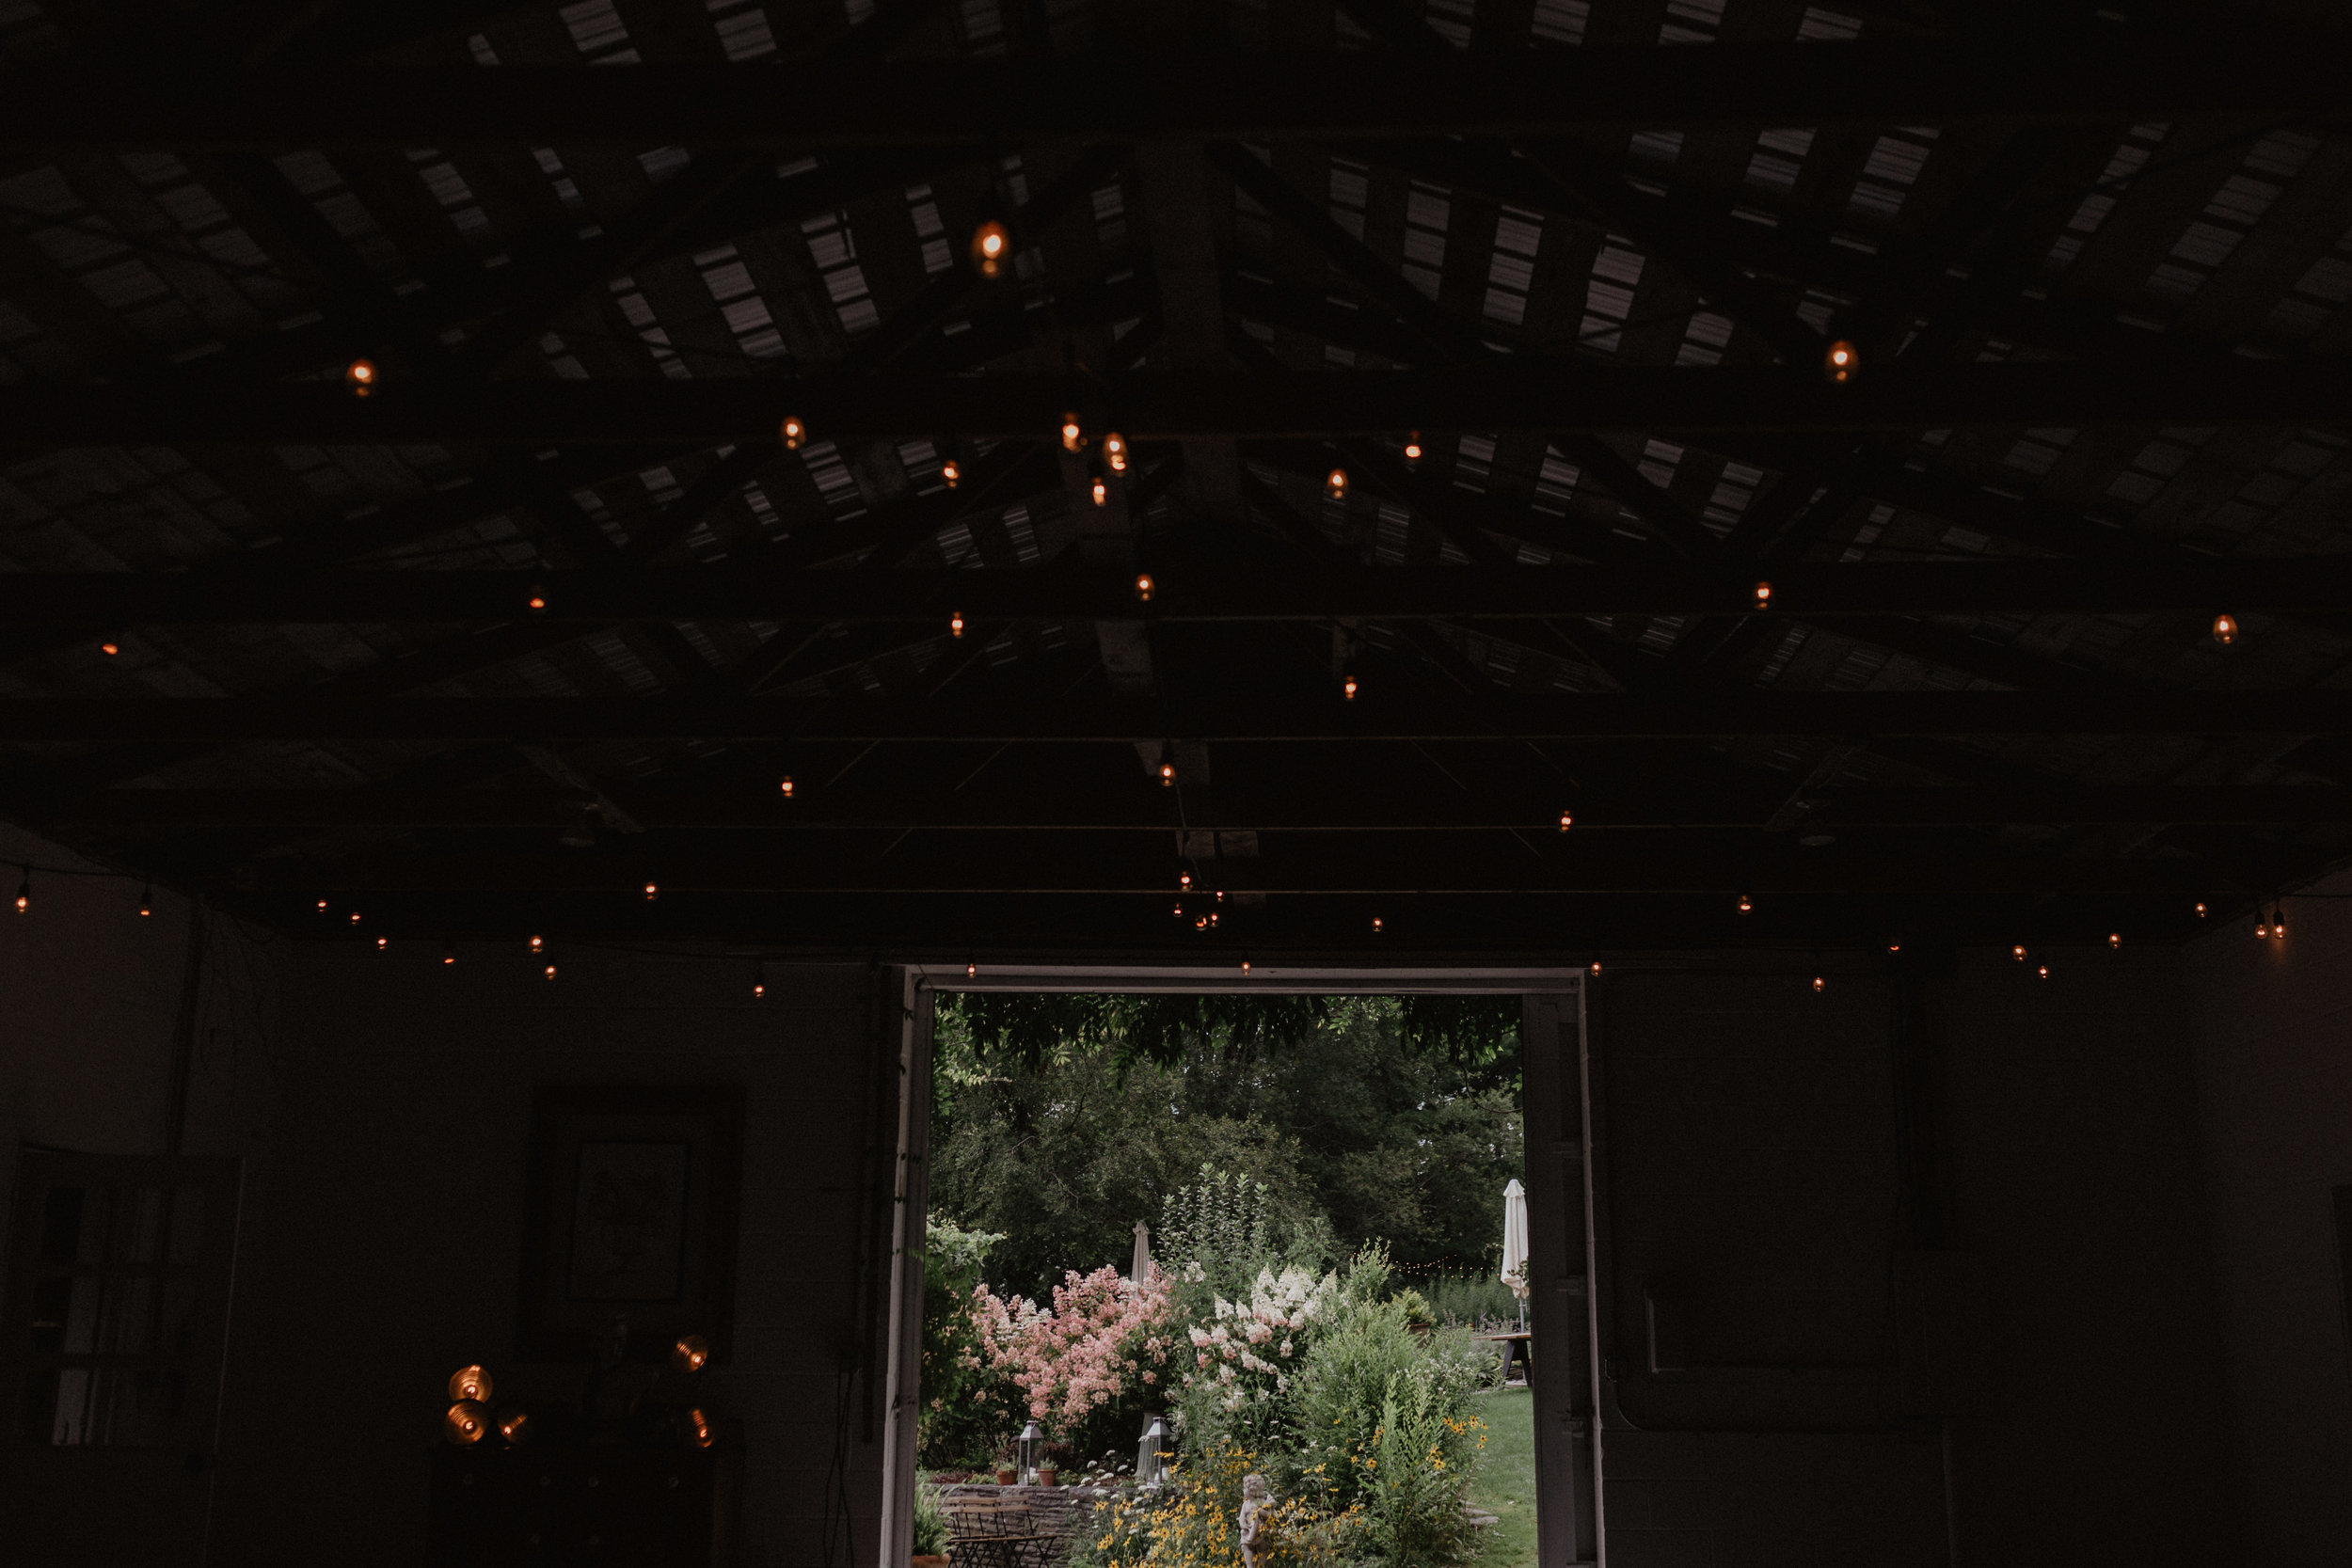 m-and-d-farm-wedding-14.jpg